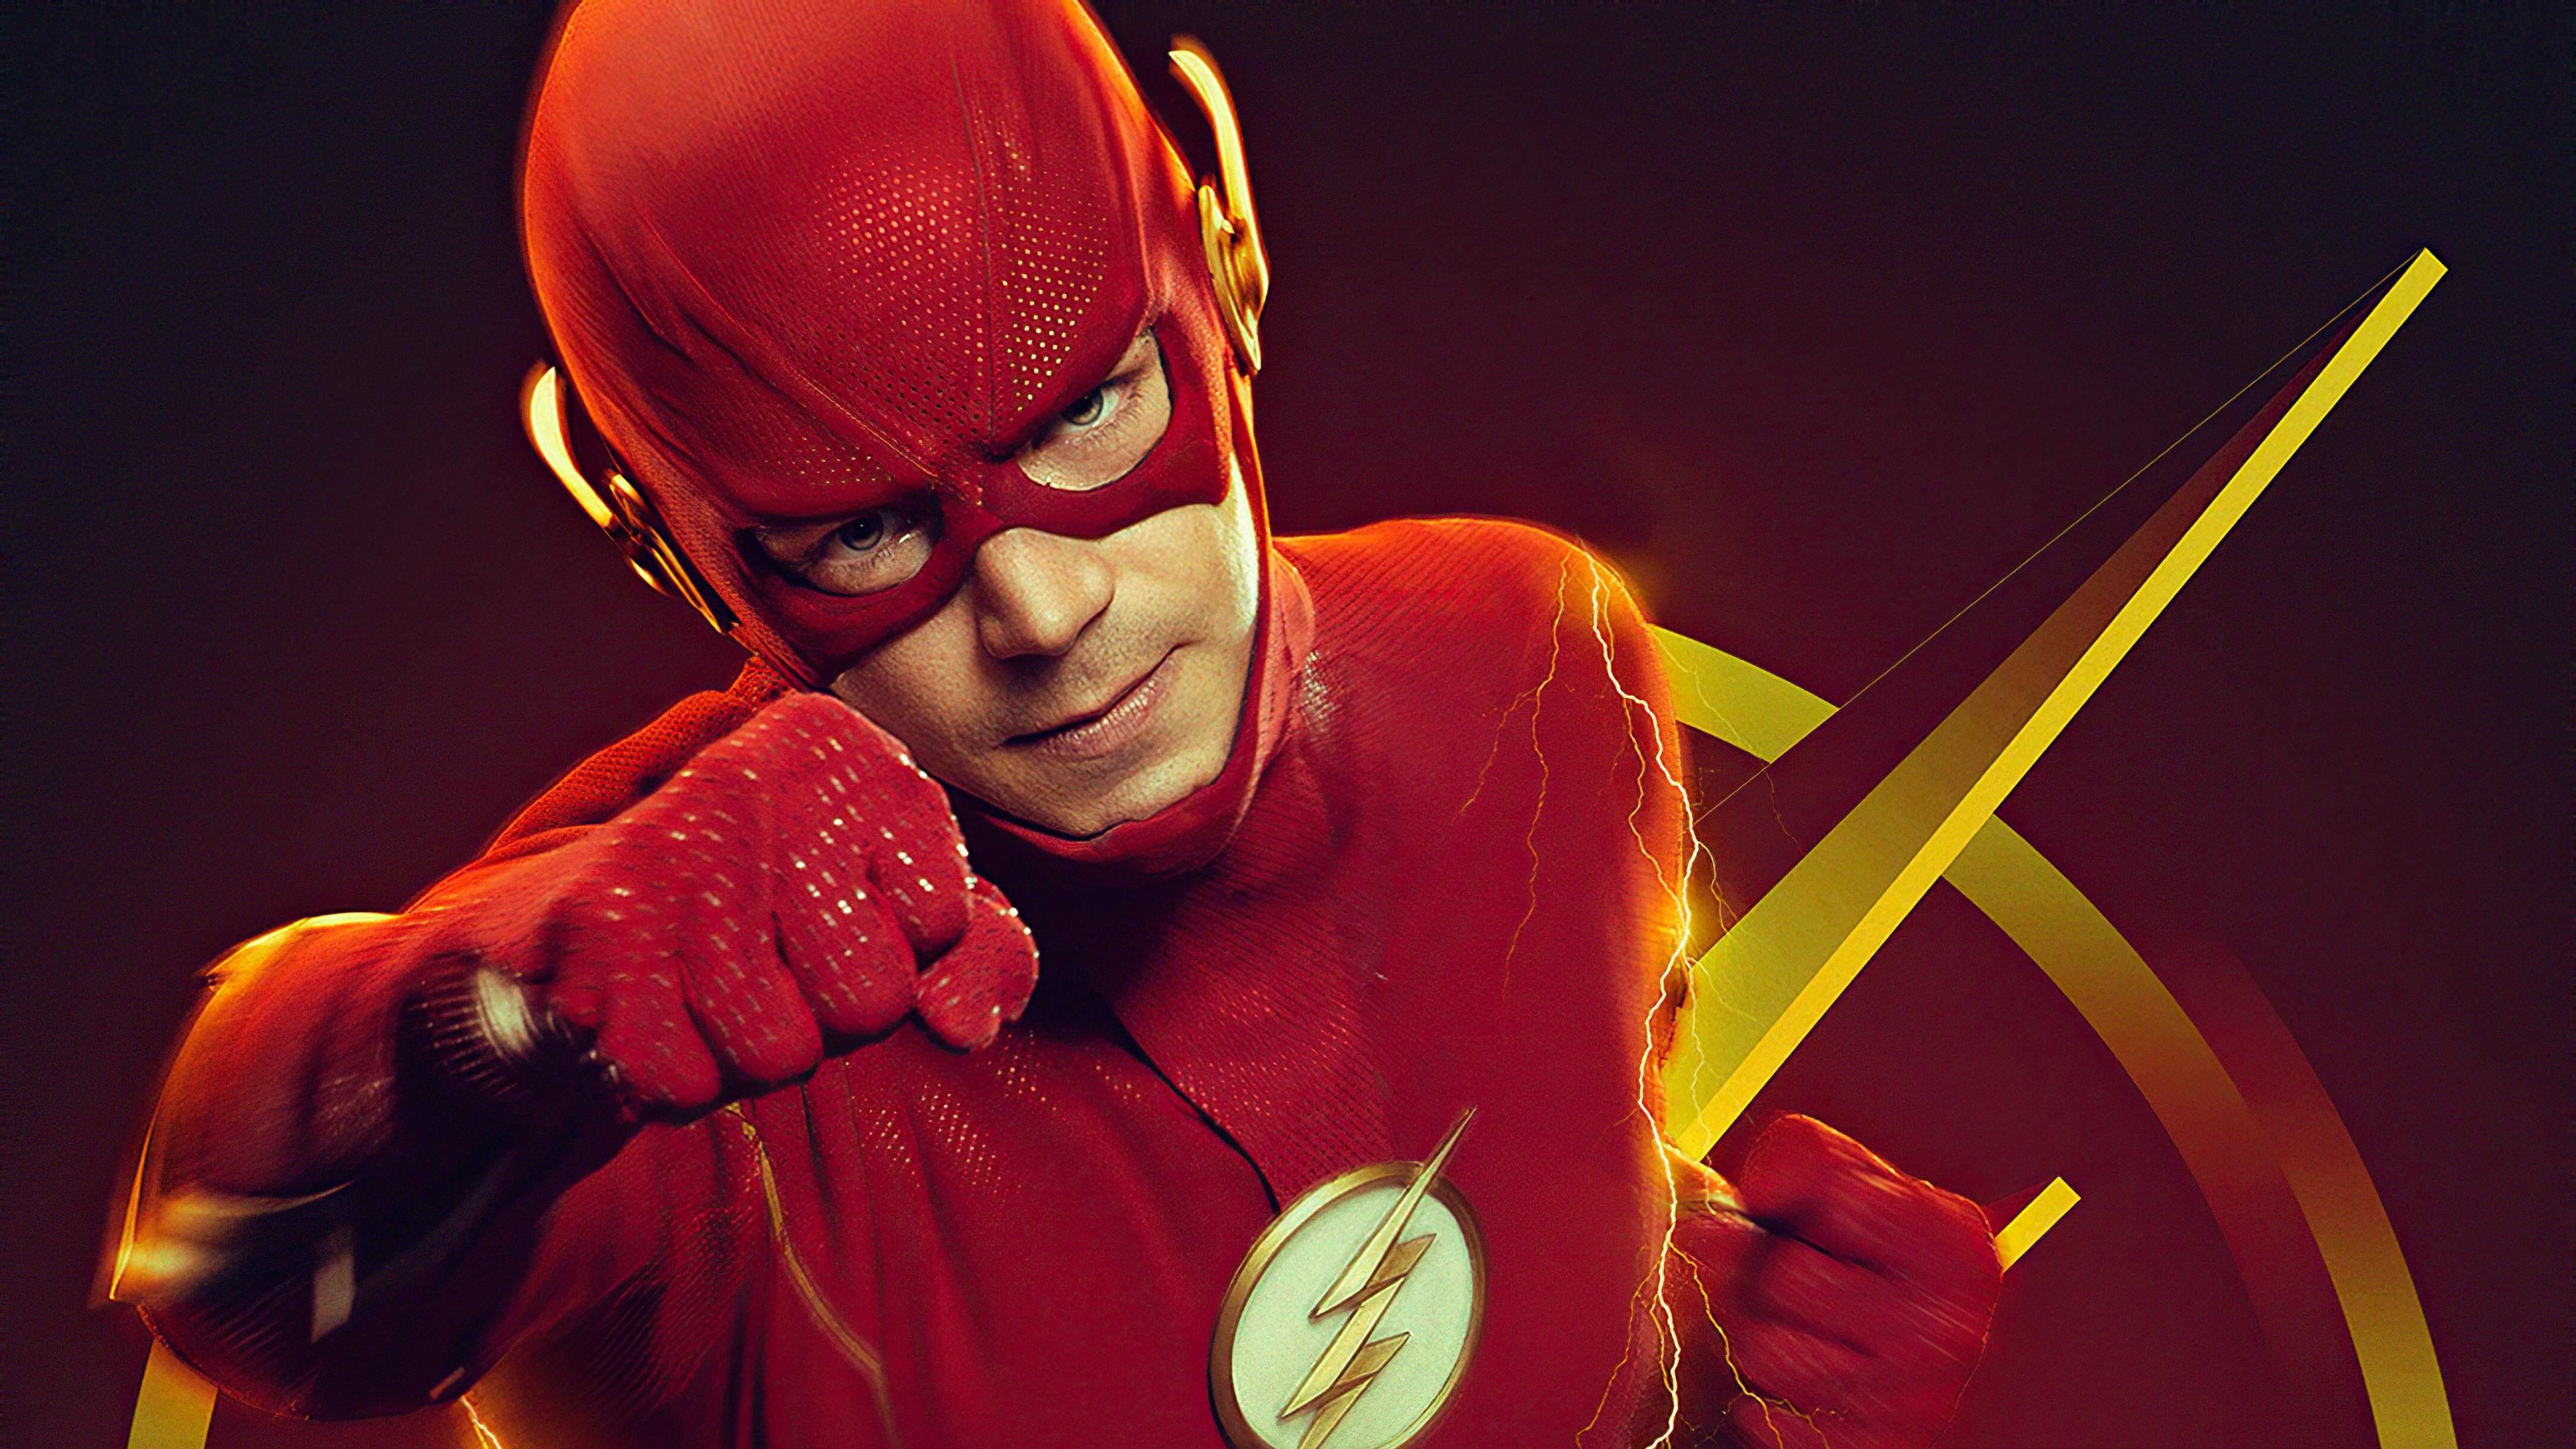 flash poster 2019 1578253065 - Flash Poster 2019 - Flash Poster 4k wallpaper, flash 2019 poster 4k wallpaper